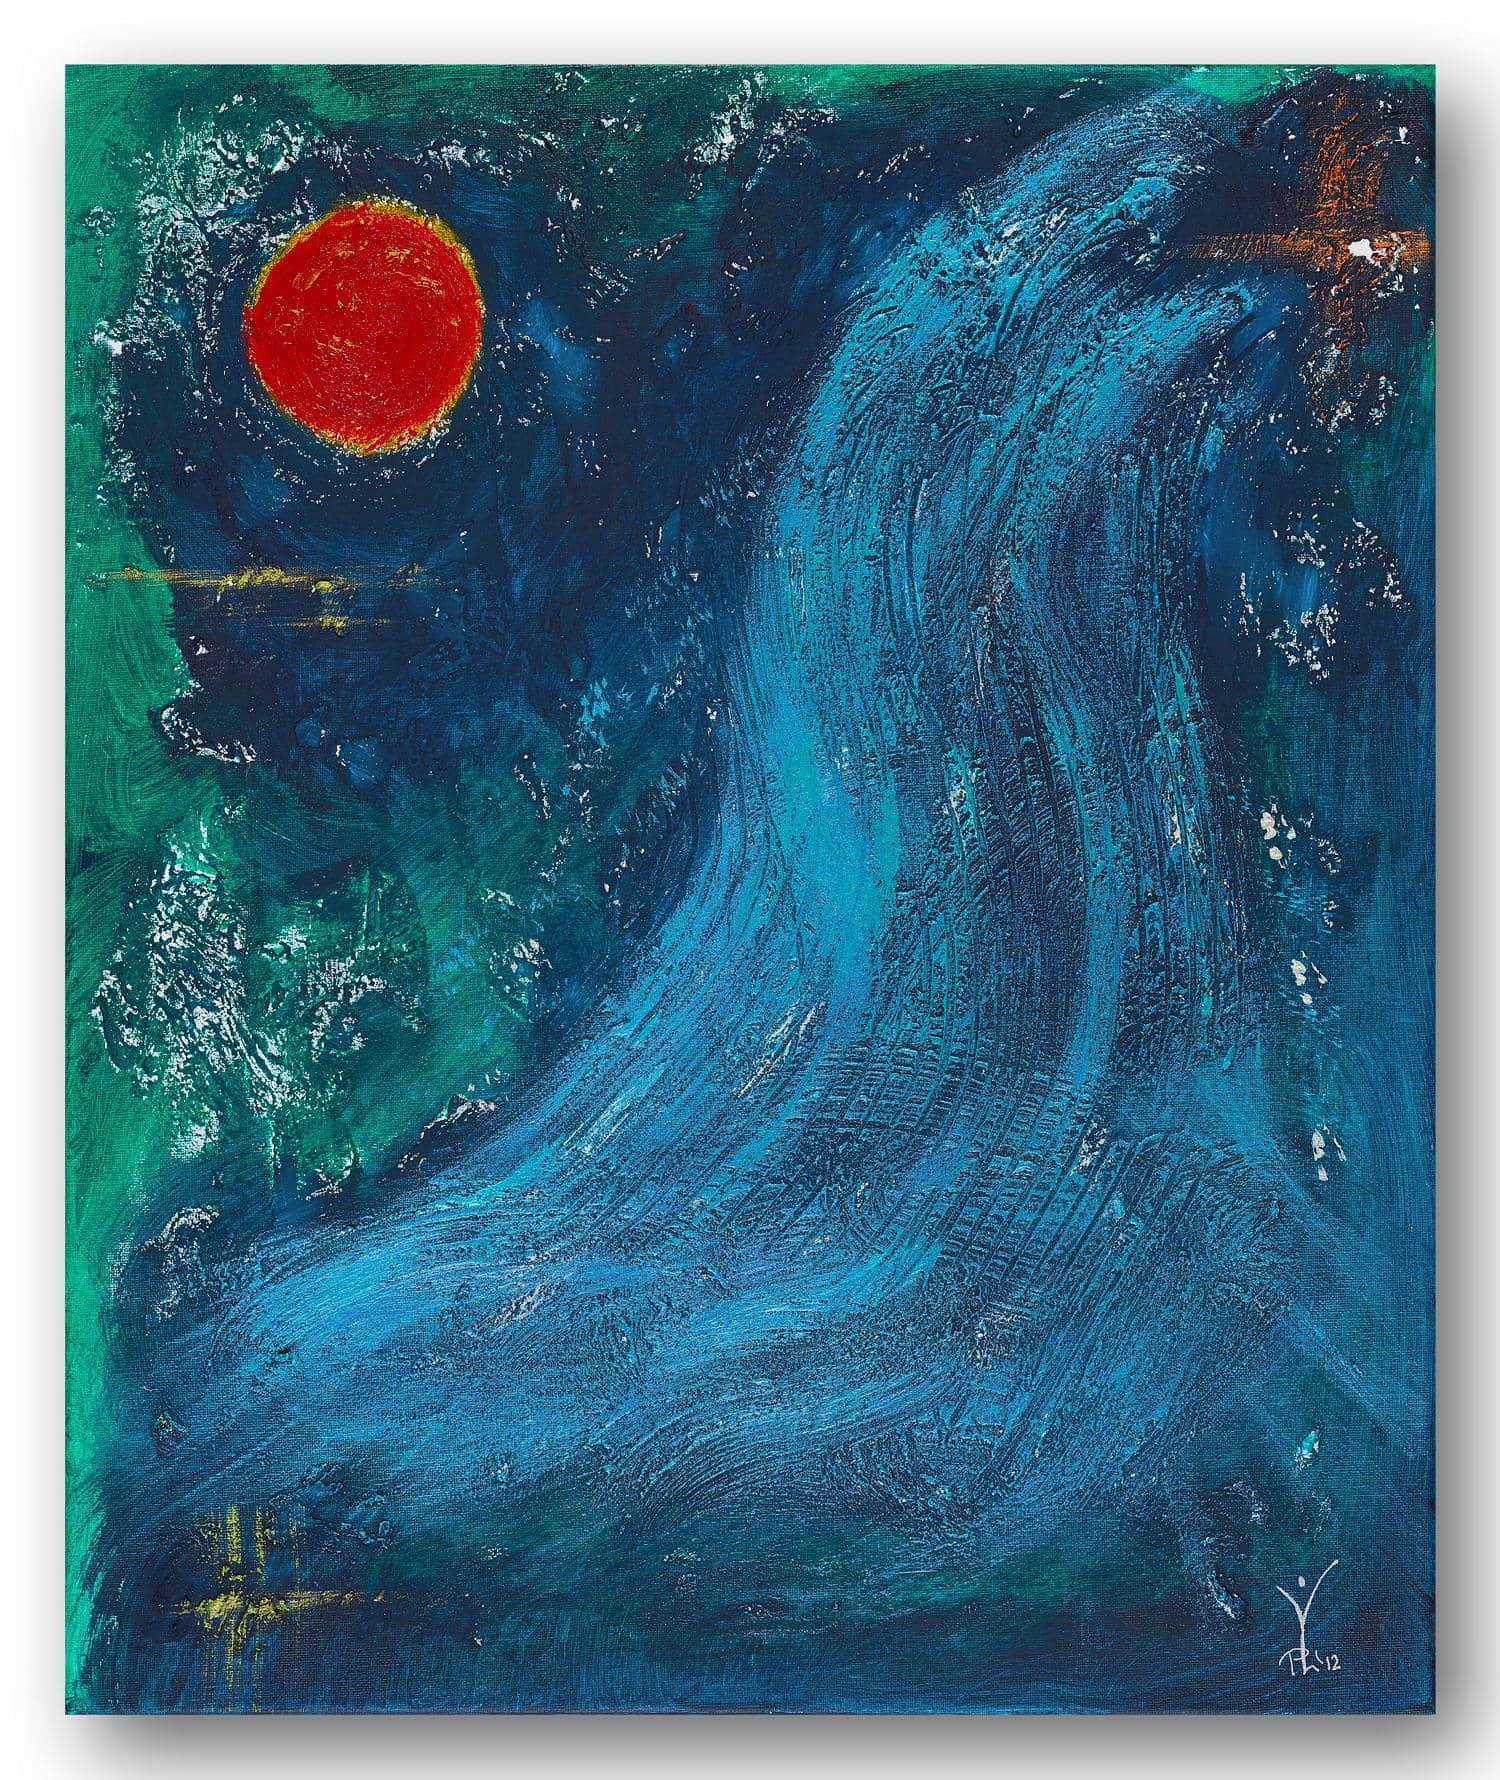 Fließender Wohlstand - Acrylic / Canvas 50 x 60 cm, 19.7 x 23.6 inch